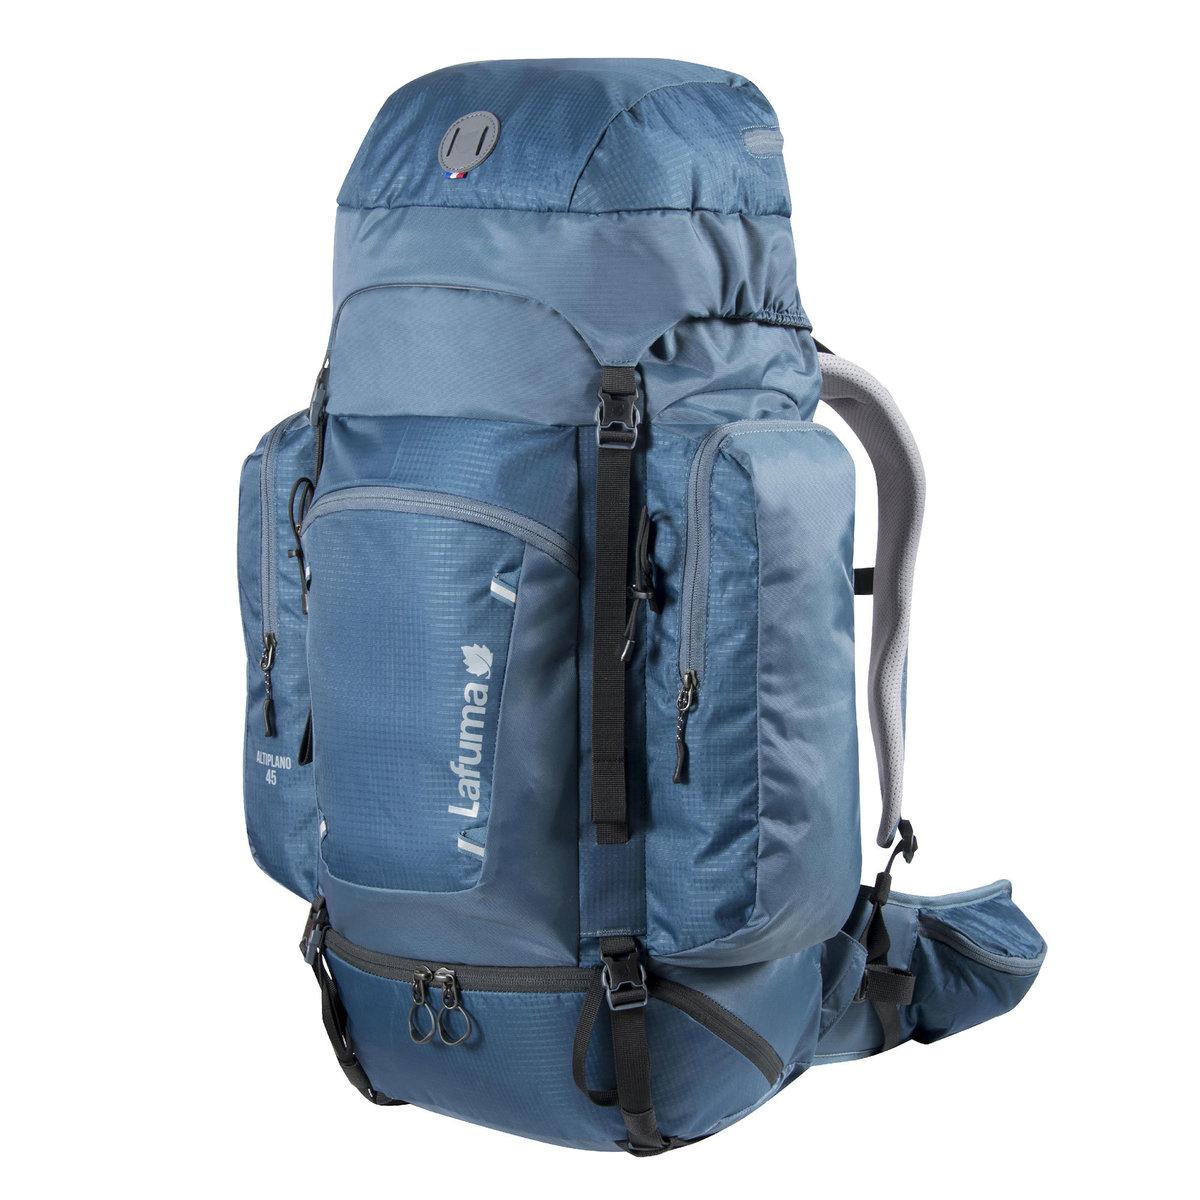 LFS6291 ALTIPLANO 45 Backpack-8604